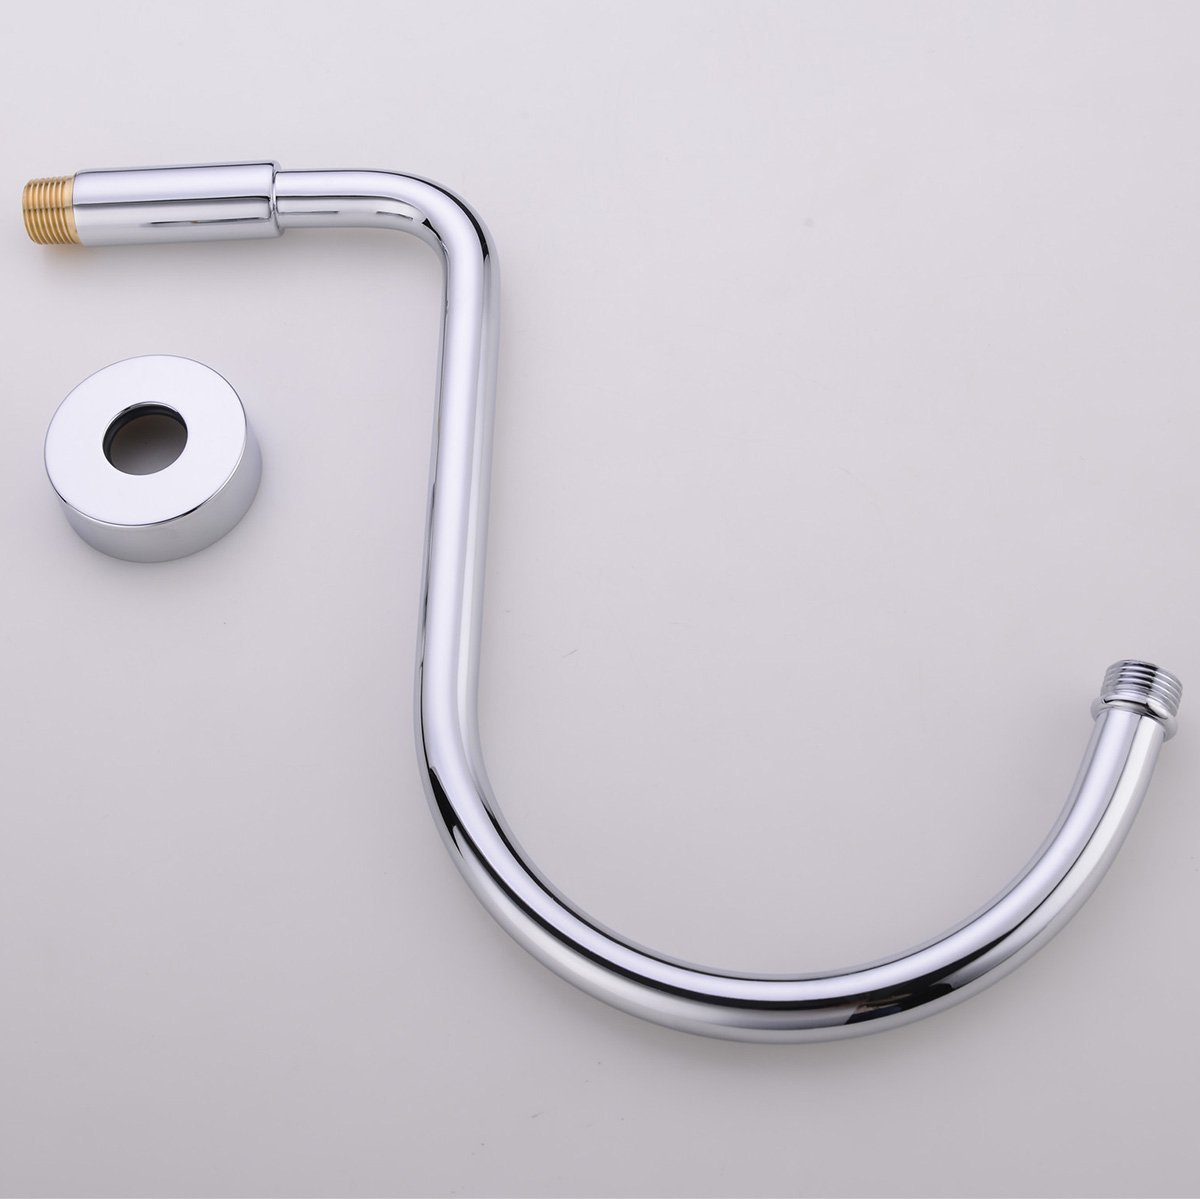 HANEBATH Brass GOOSENECK Extension Shower Arm with Flange, Chrome ...